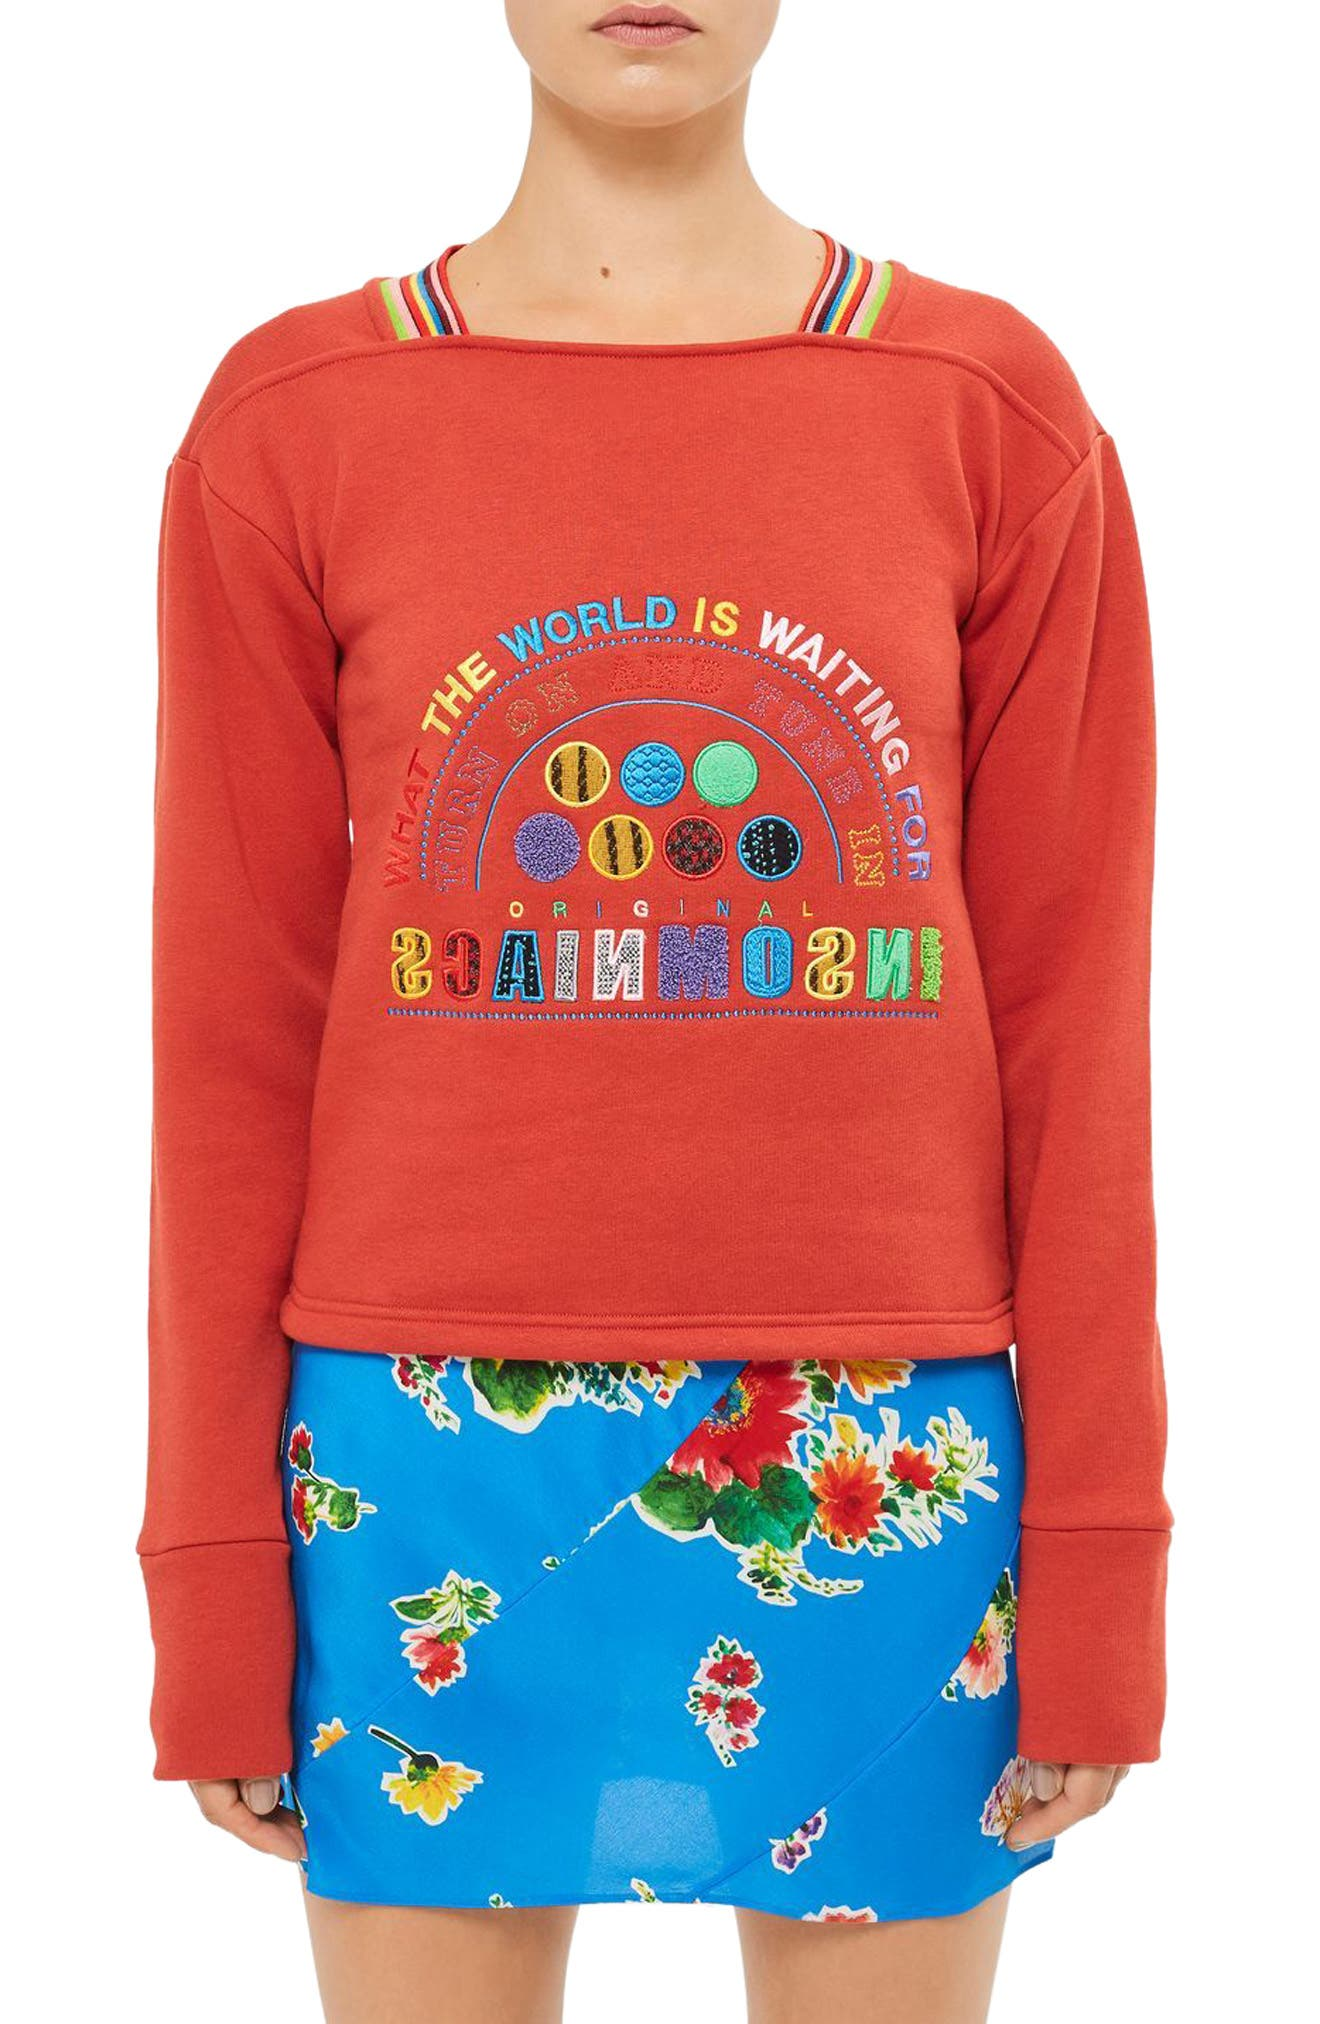 Topshop Unique Northside Sweatshirt